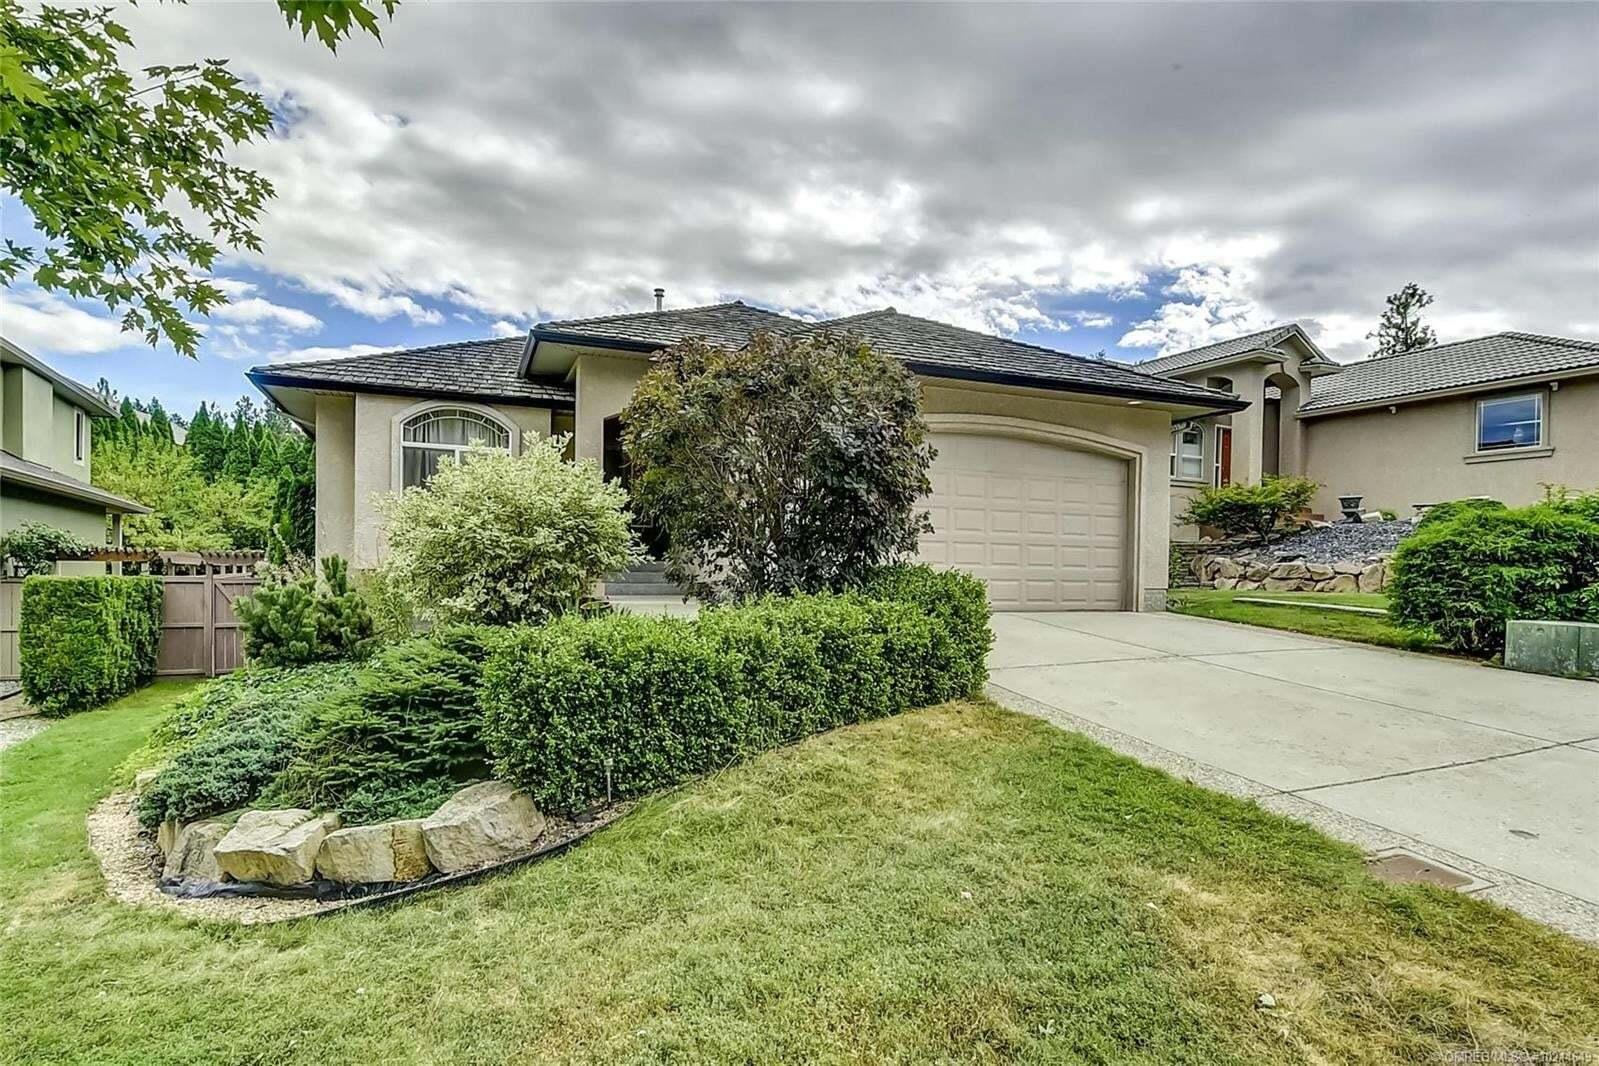 House for sale at 2505 Quail Pl Kelowna British Columbia - MLS: 10214649